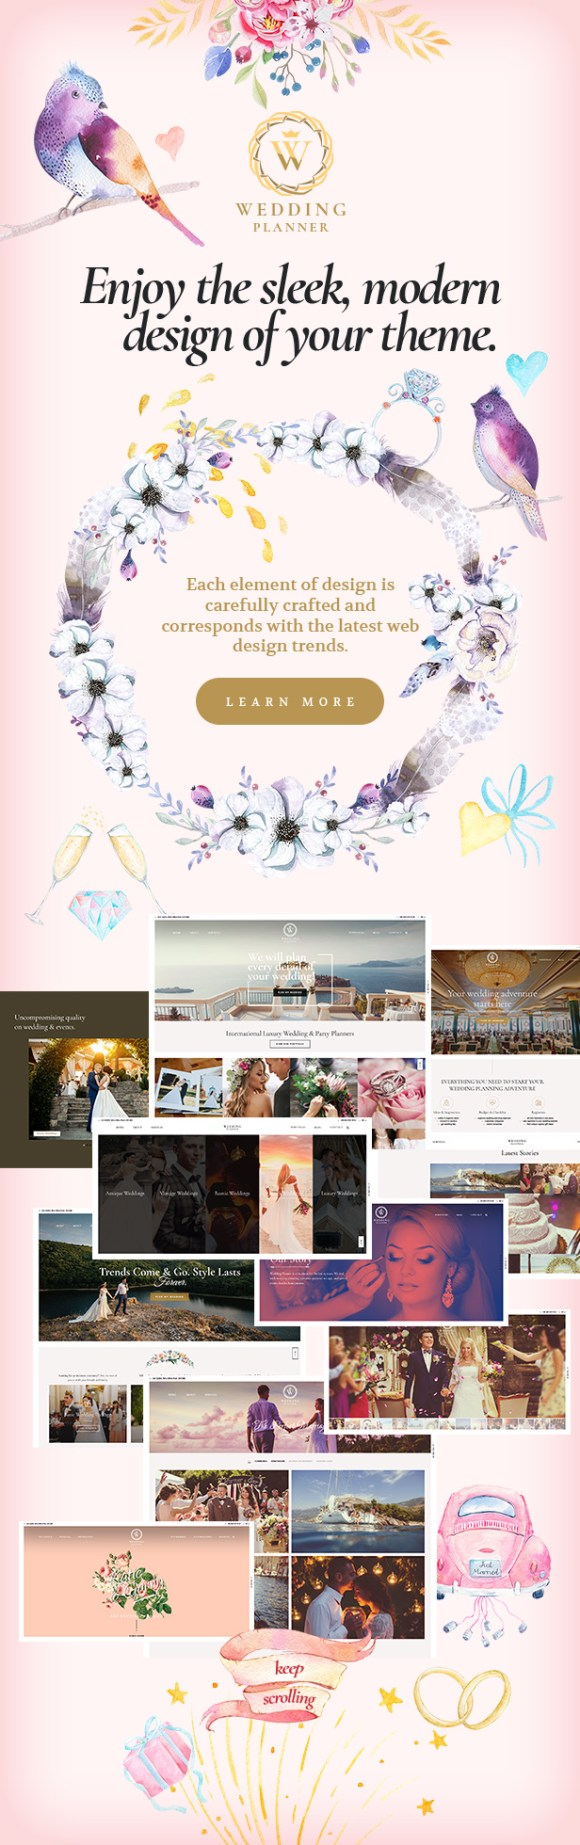 Wedding Planner - Responsive WordPress Theme - 3